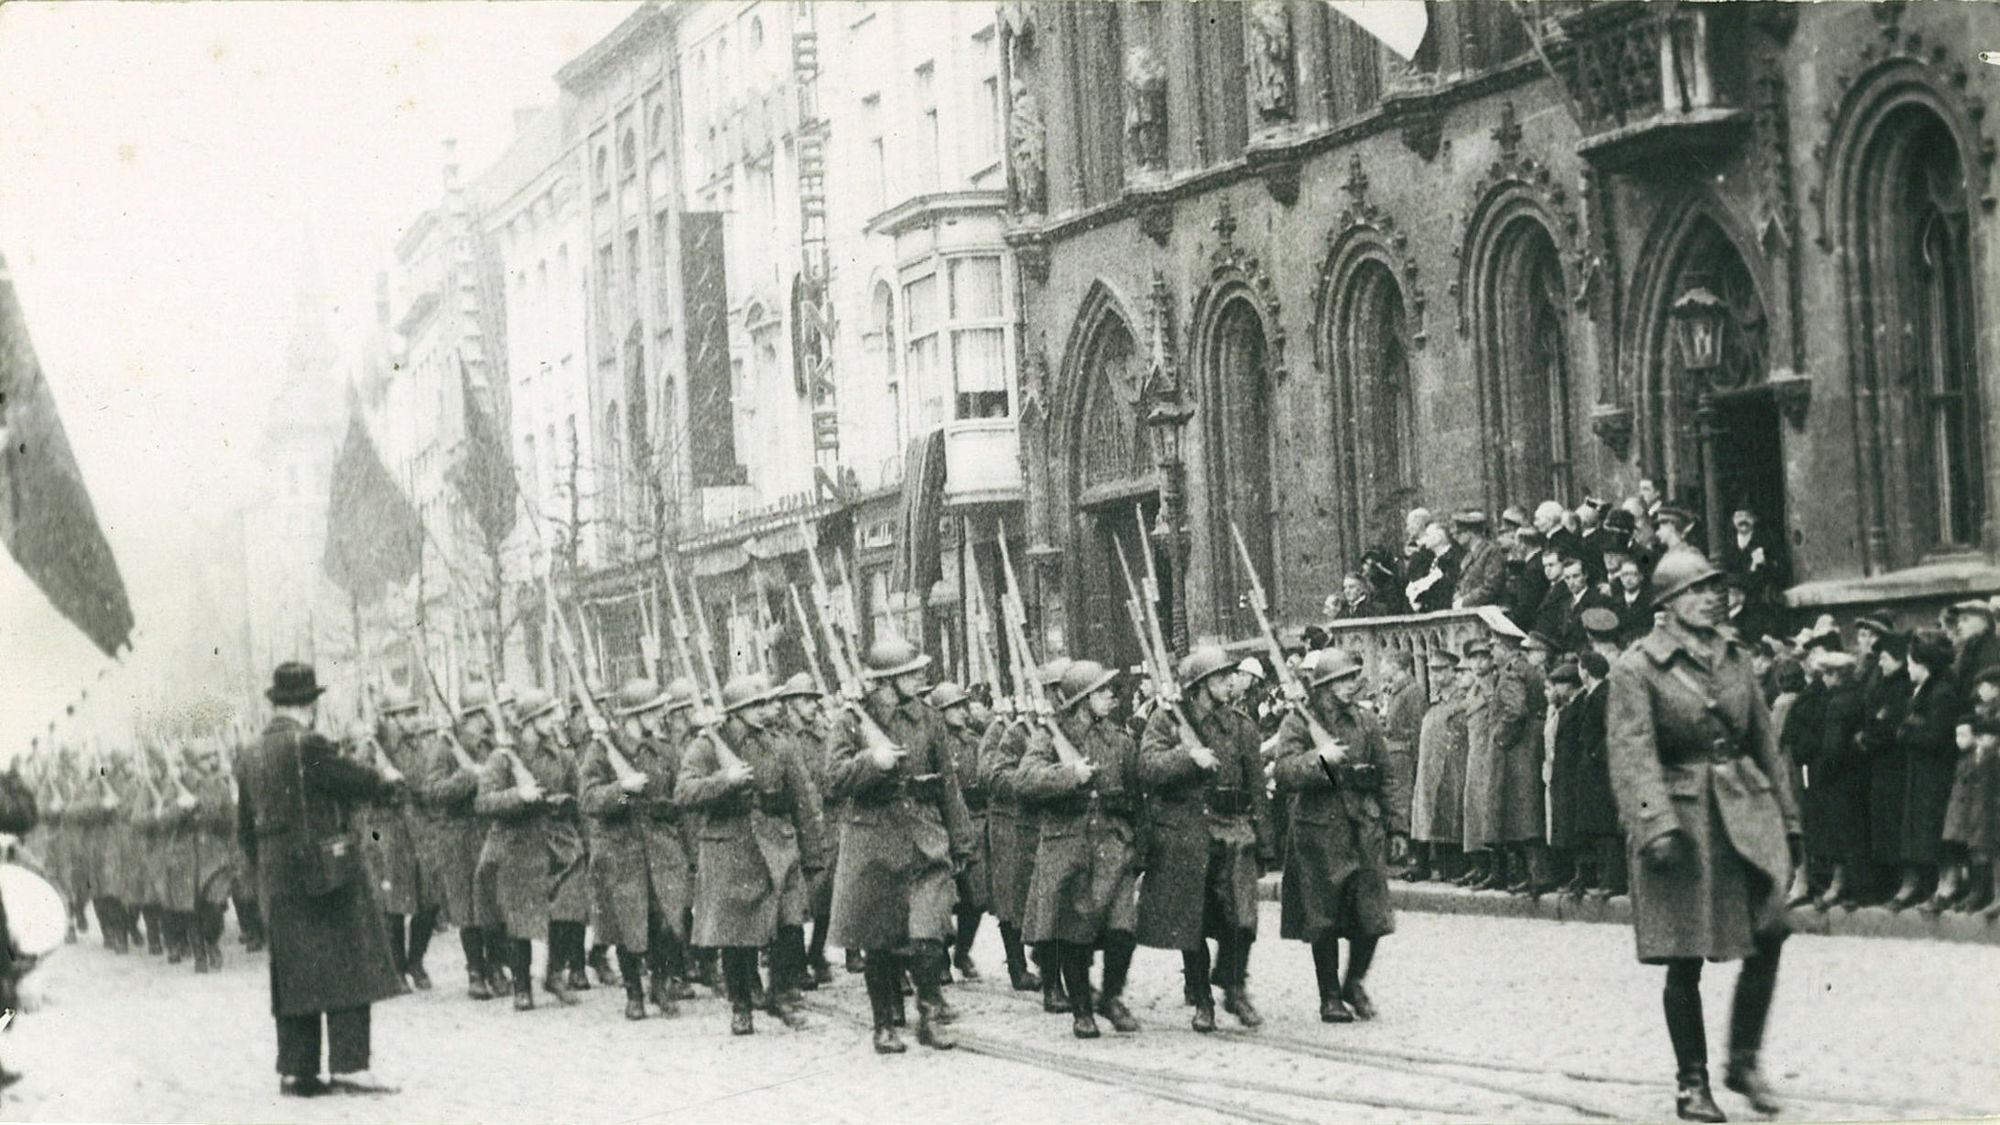 Grote Markt in 1939